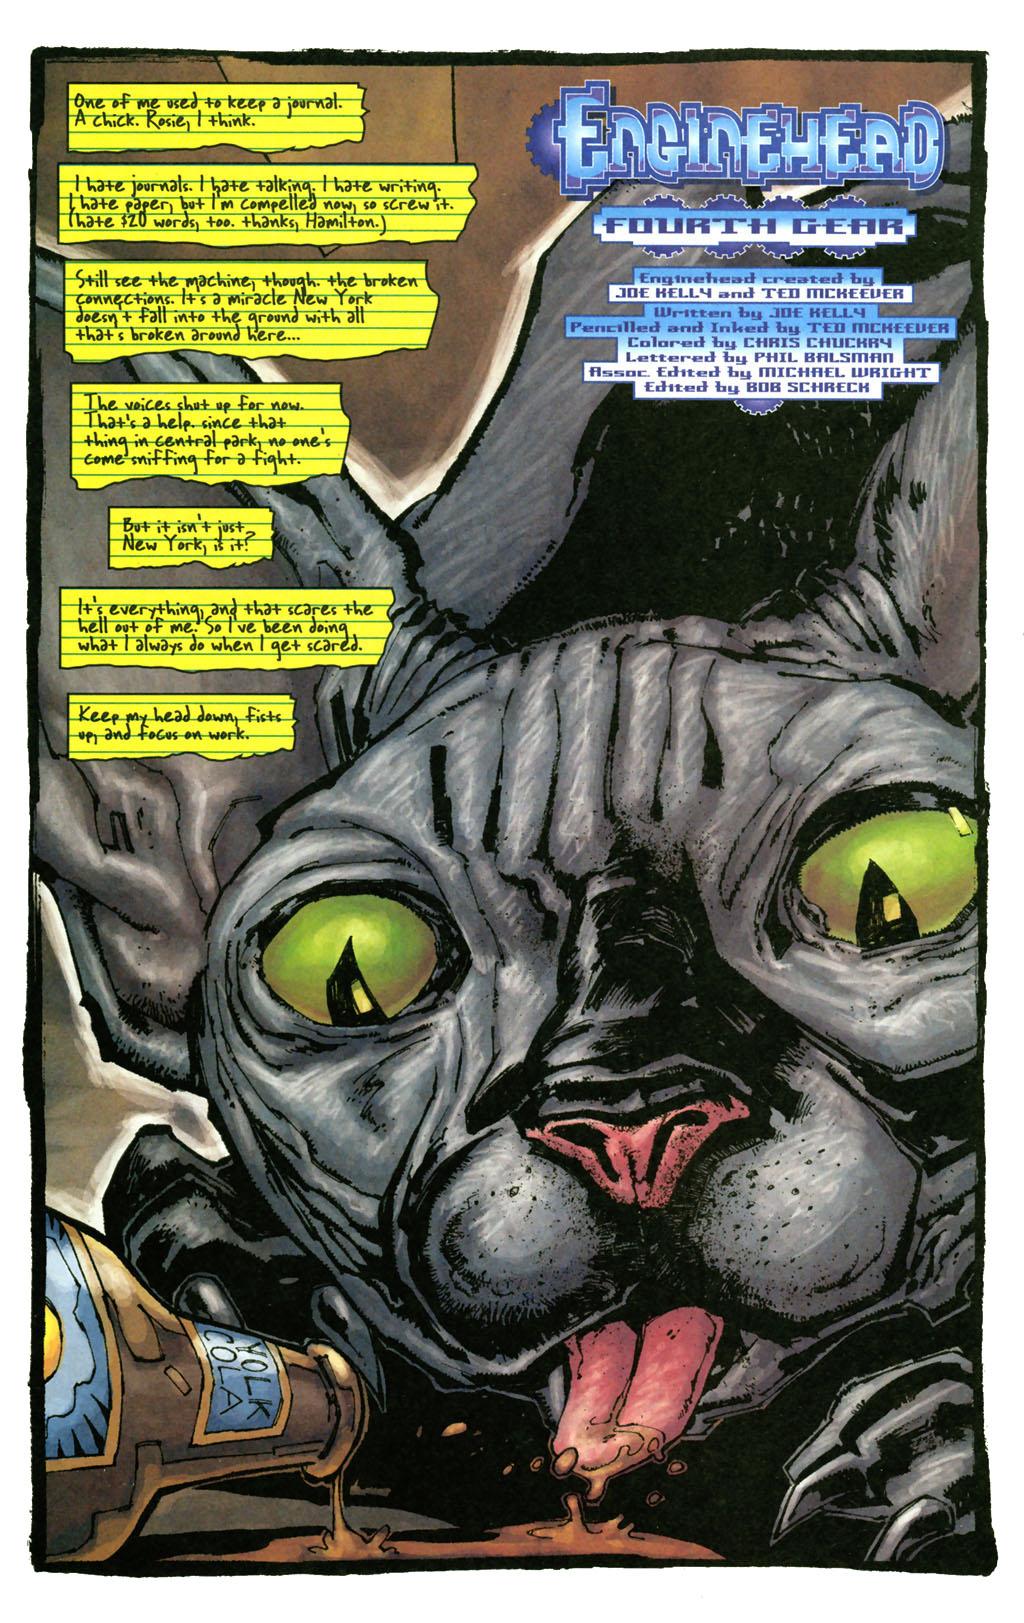 Read online Enginehead comic -  Issue #4 - 2